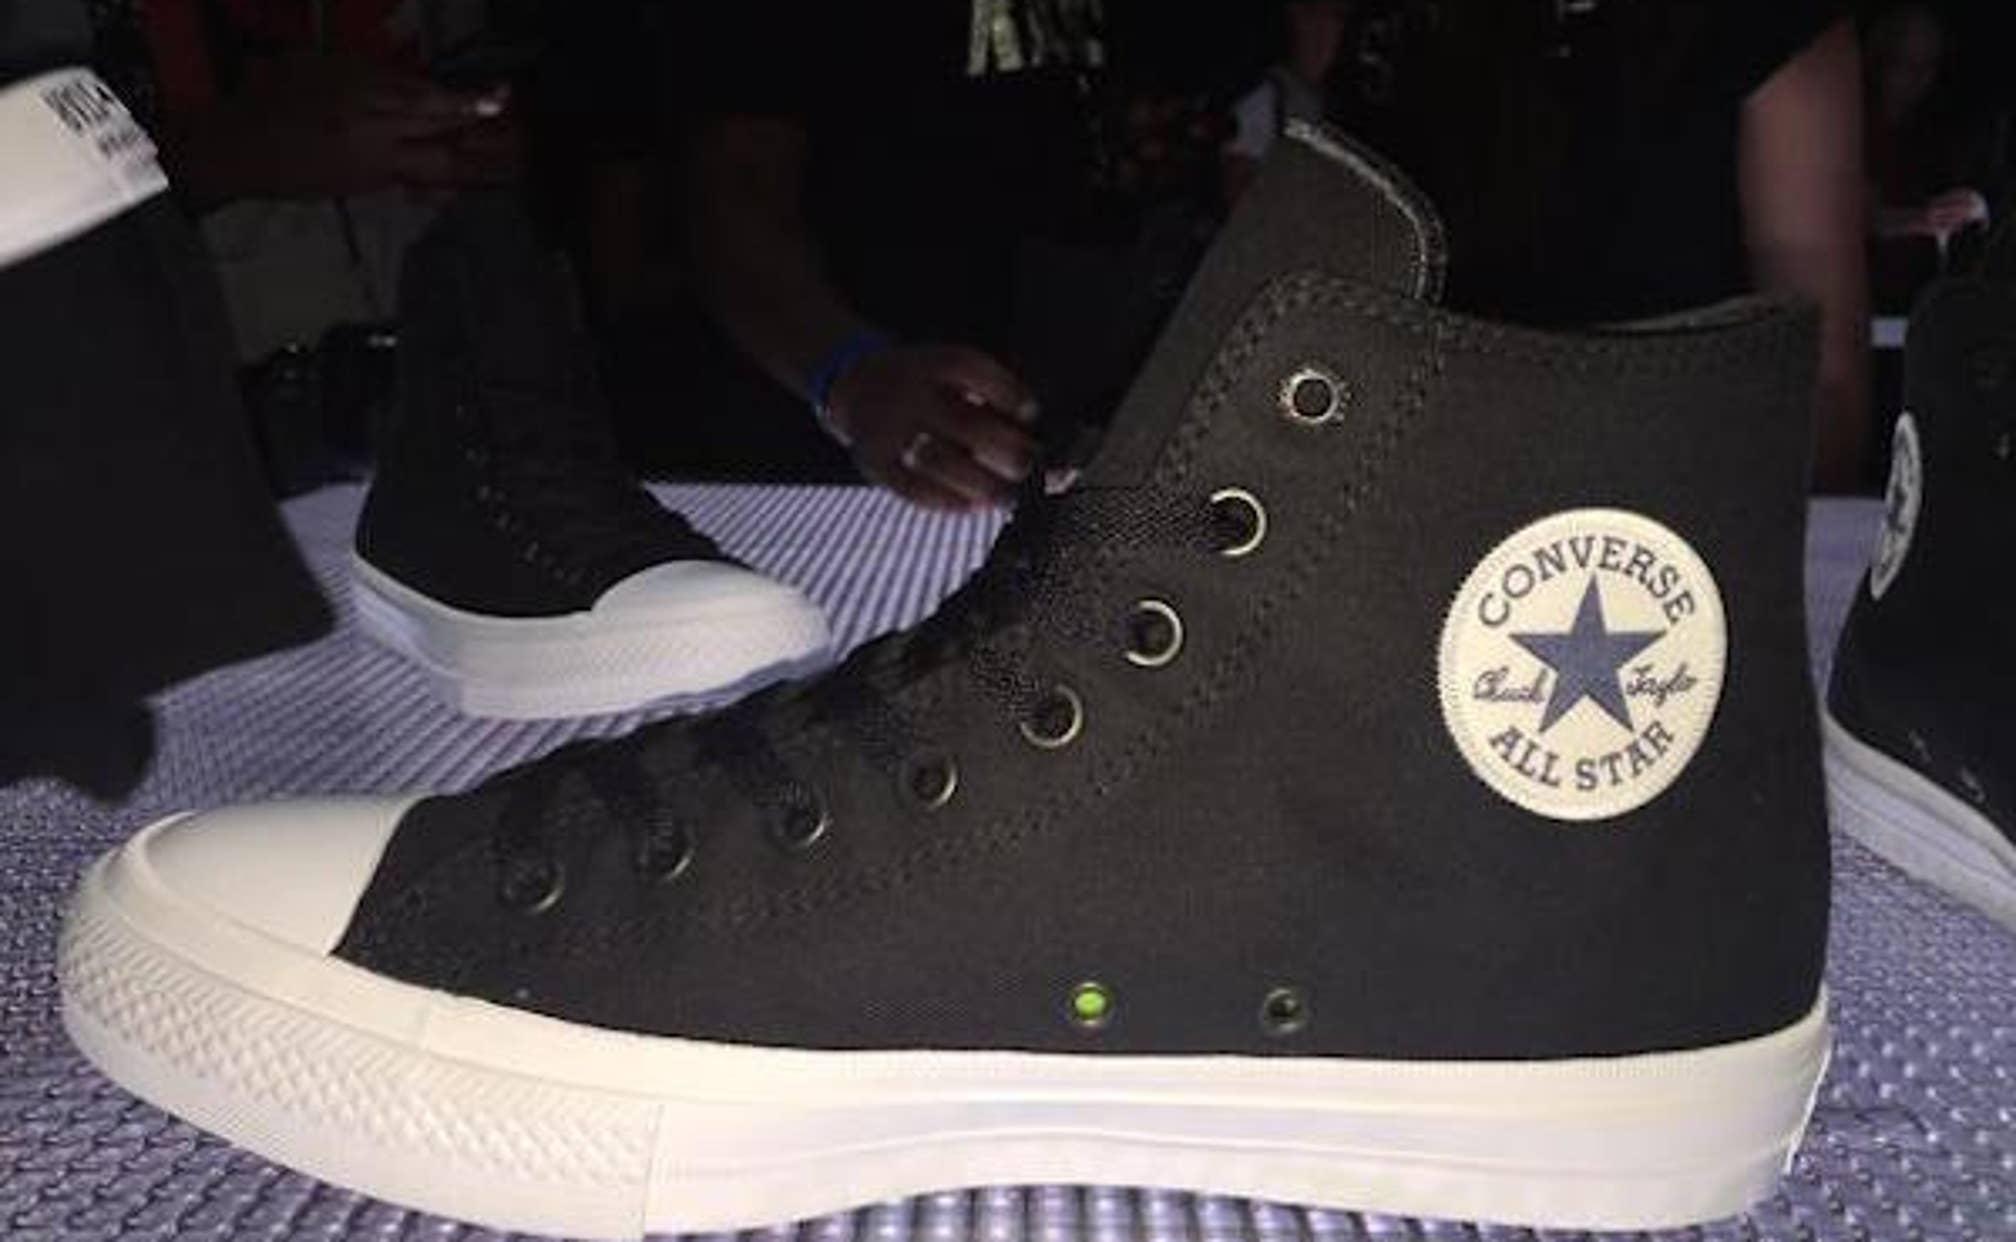 Converse releases more comfy Chuck